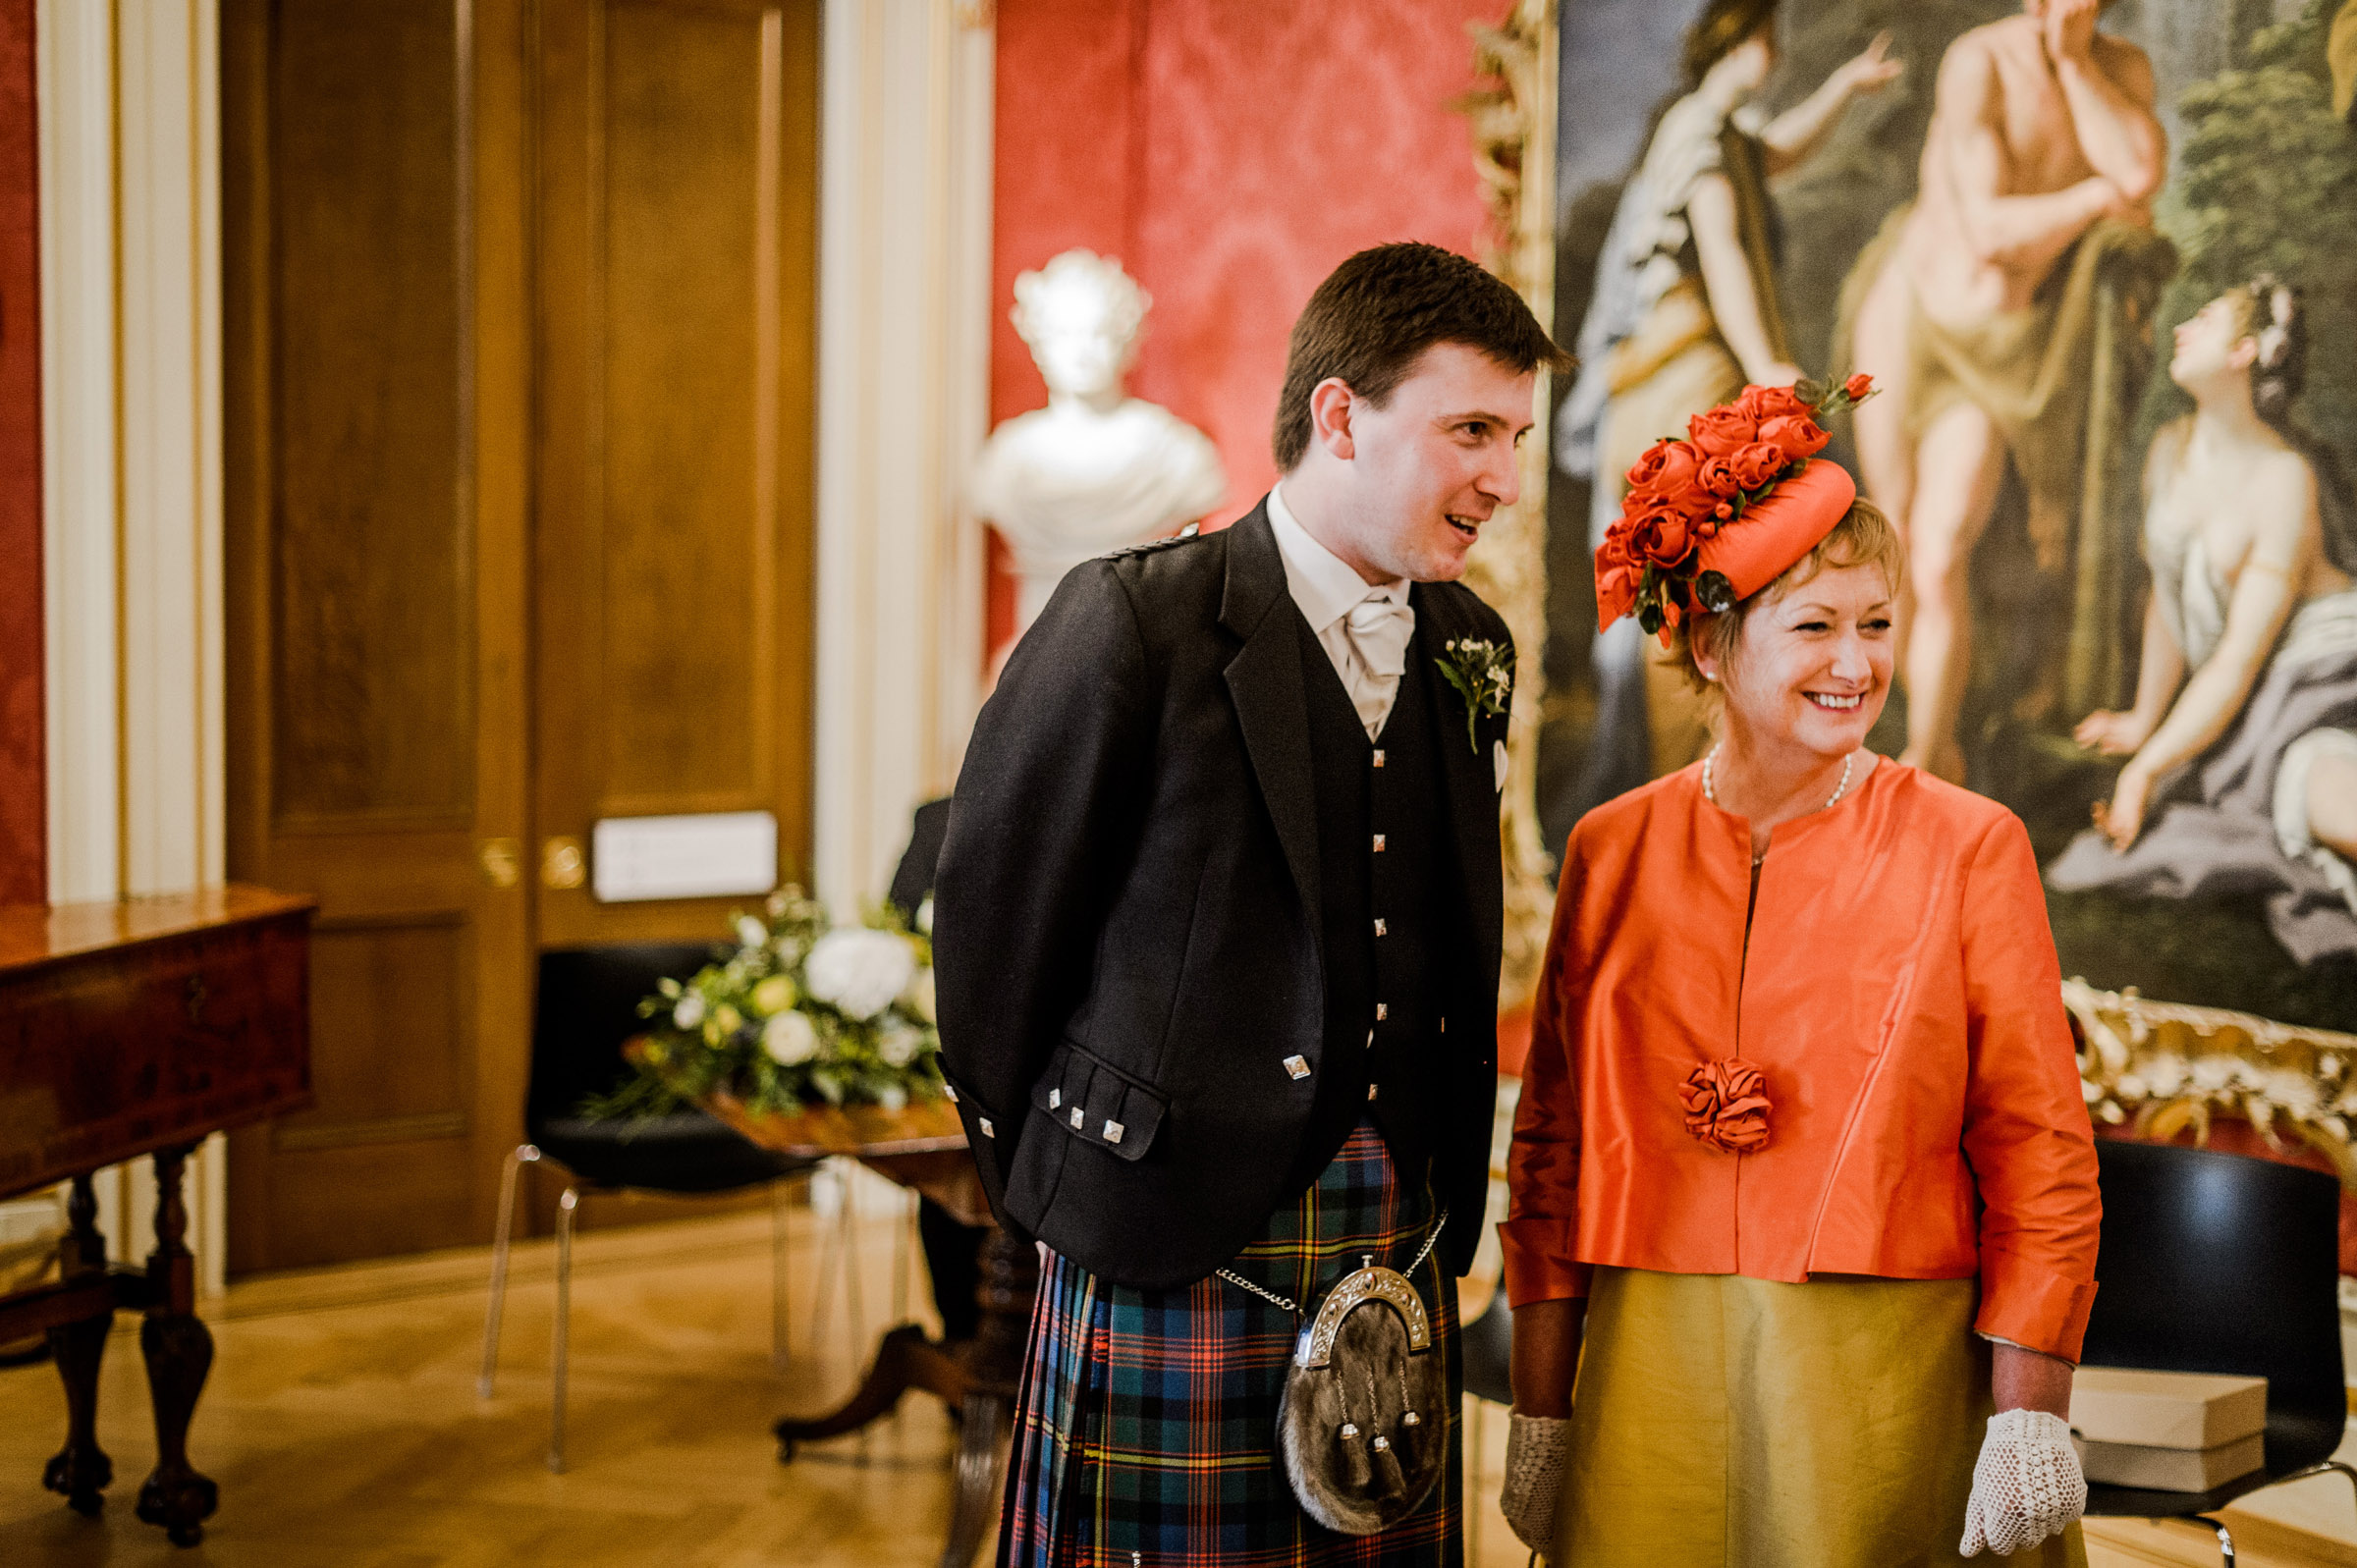 Ashmolean-Museum-Wedding-Pictures-0023.jpg